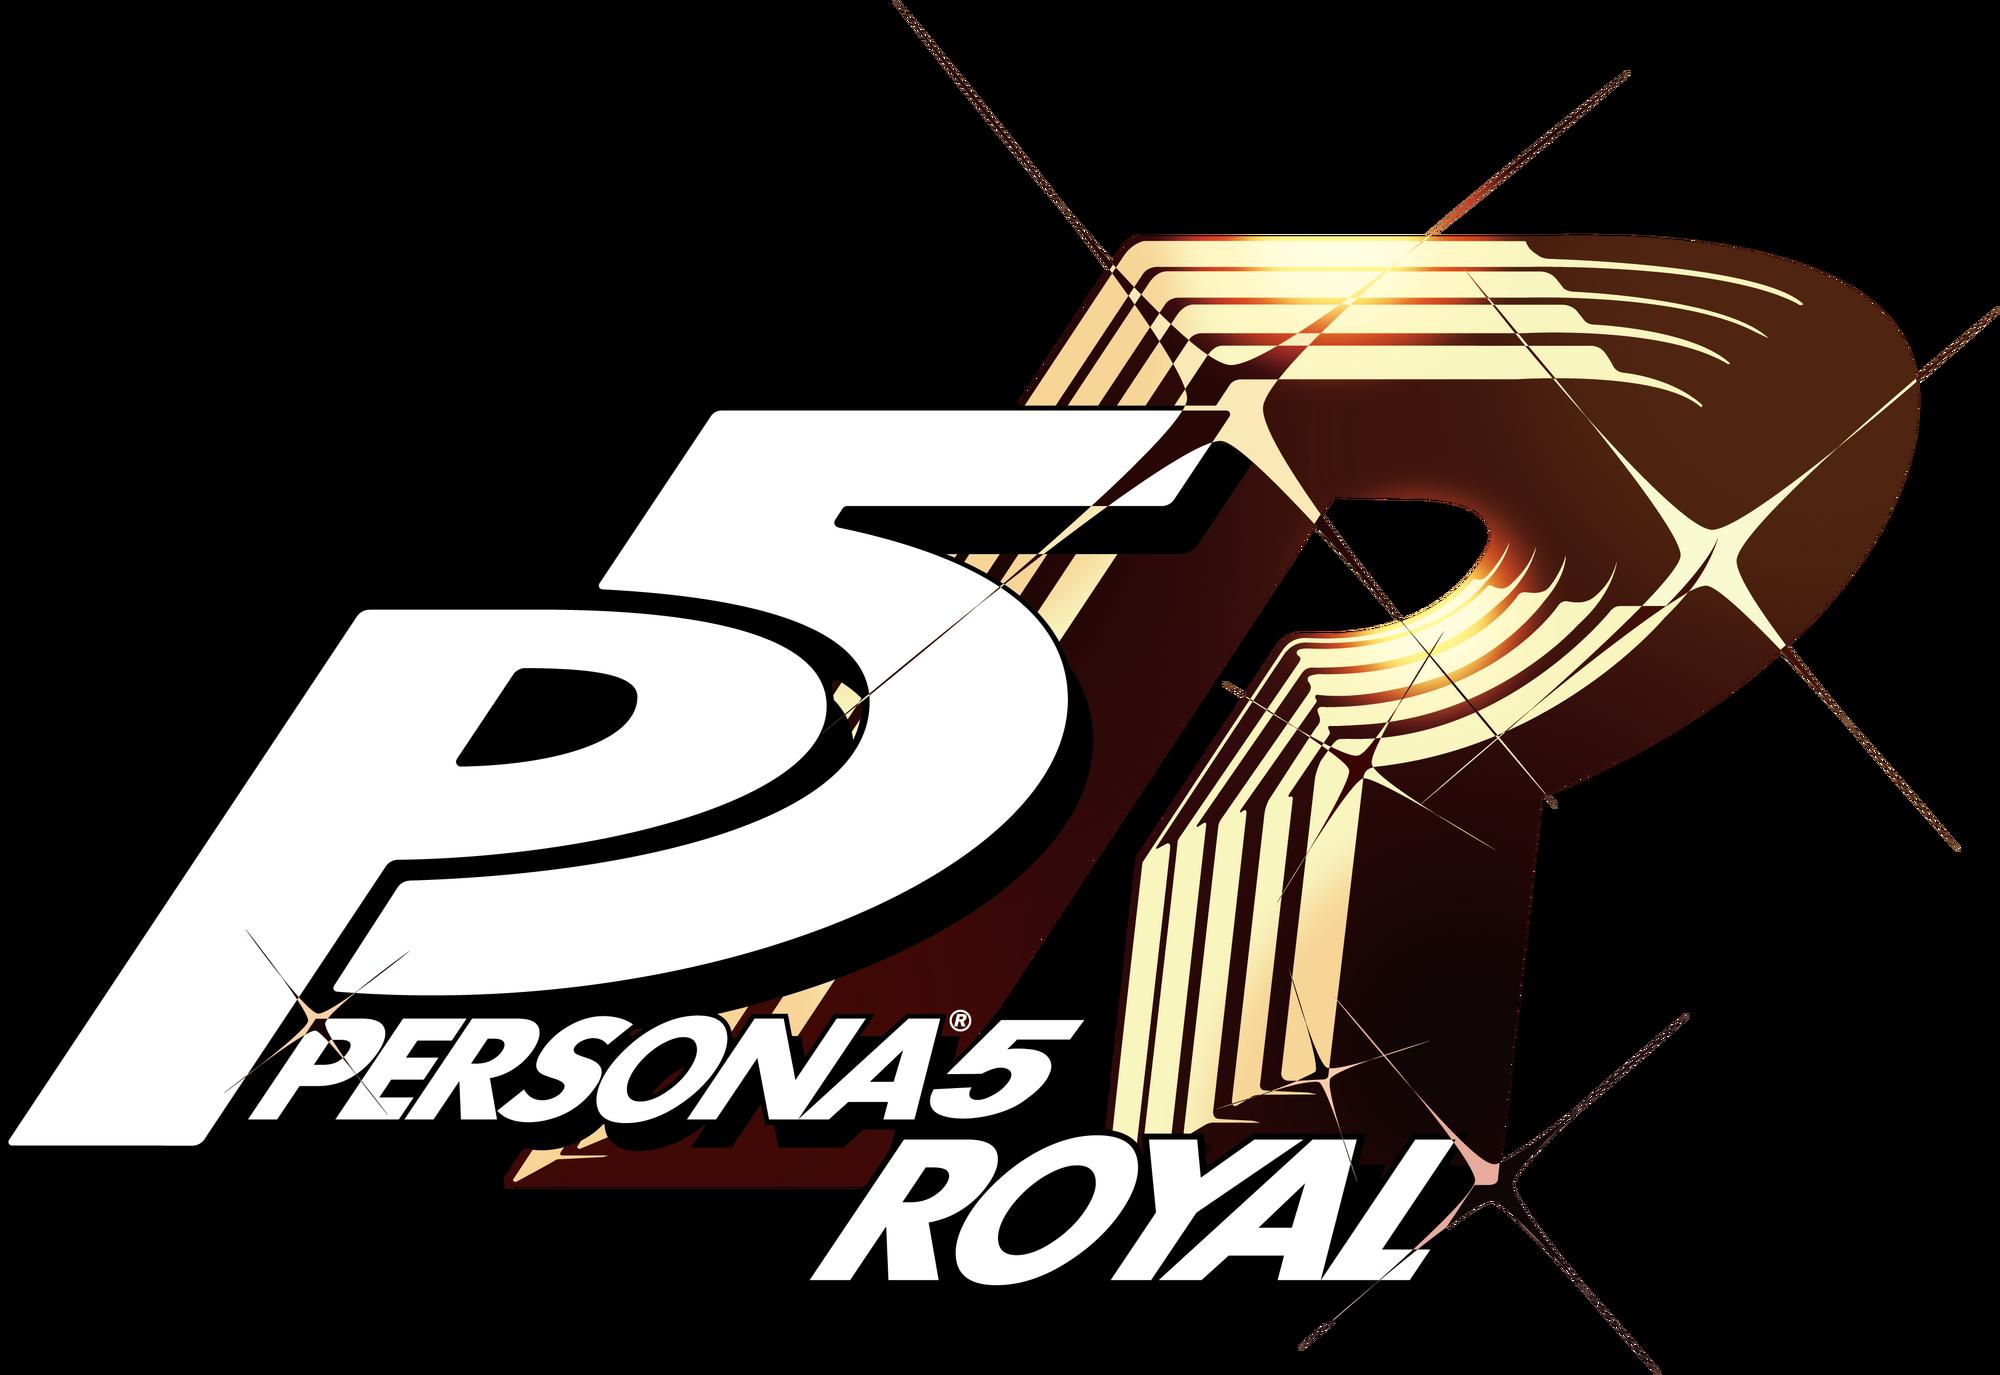 Persona 5 Royal | Megami Tensei Wiki | FANDOM powered by Wikia